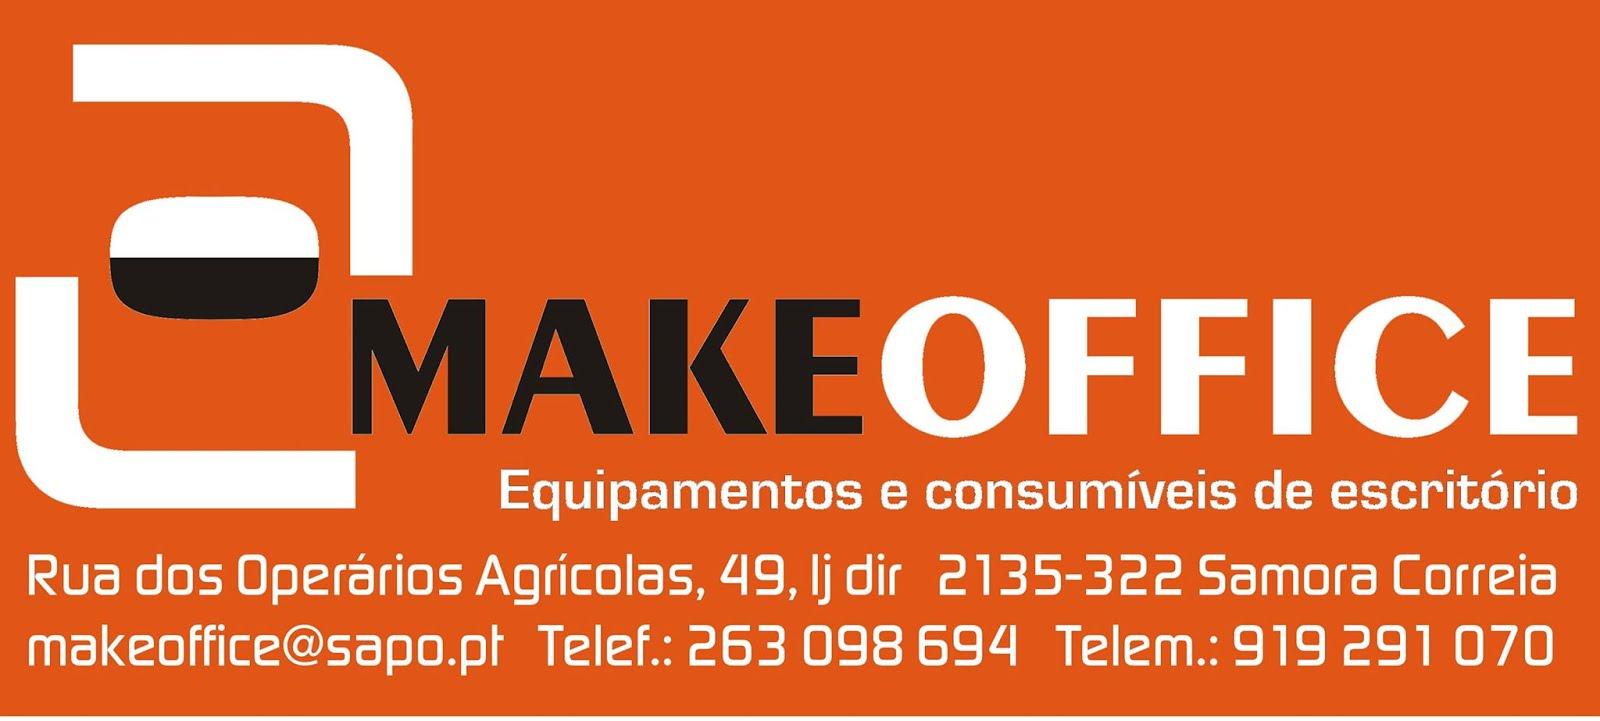 MakeOffice